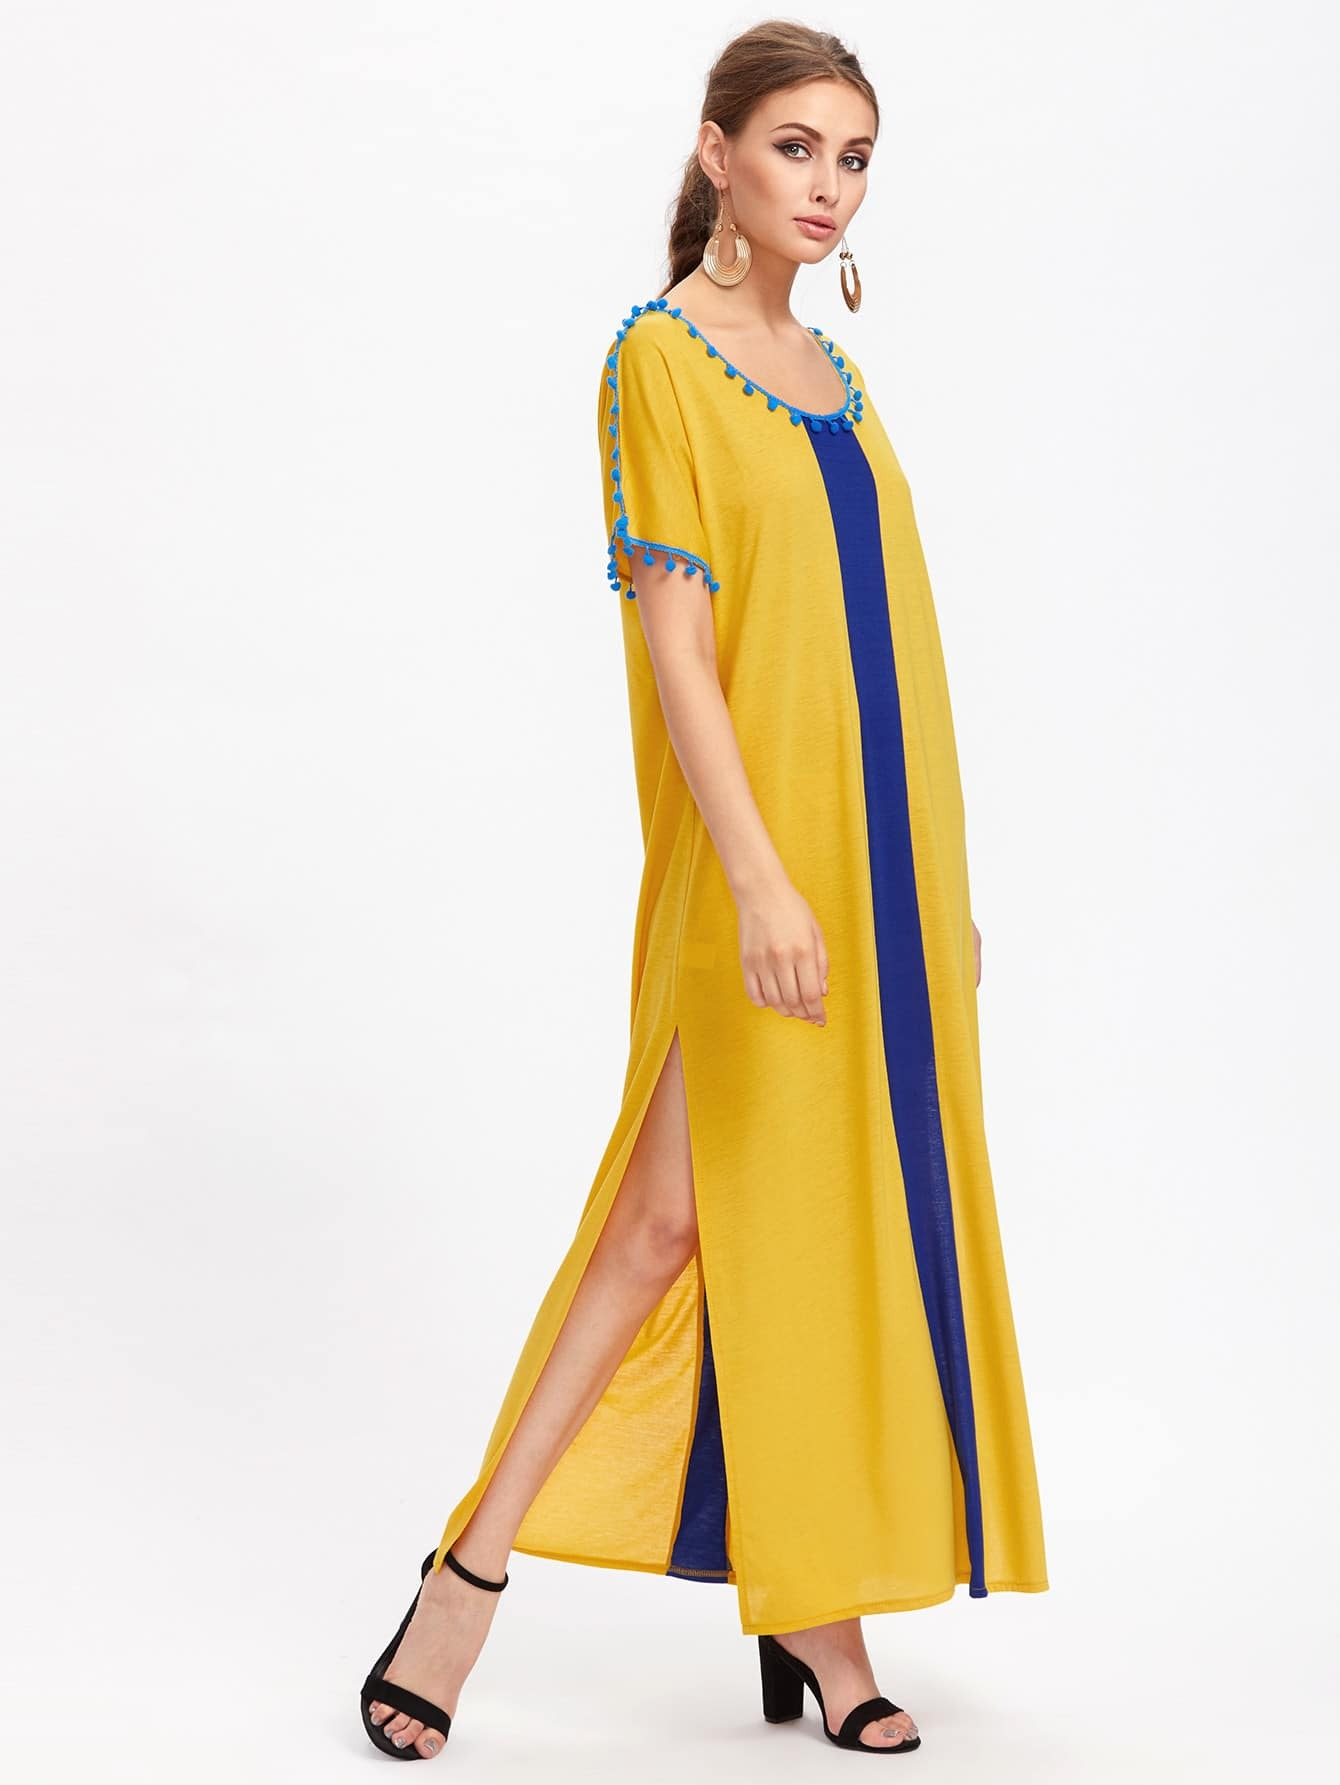 a51ddbddf7e Contrast Panel Slit Side Pom Pom Trim Dress EmmaCloth-Women ...